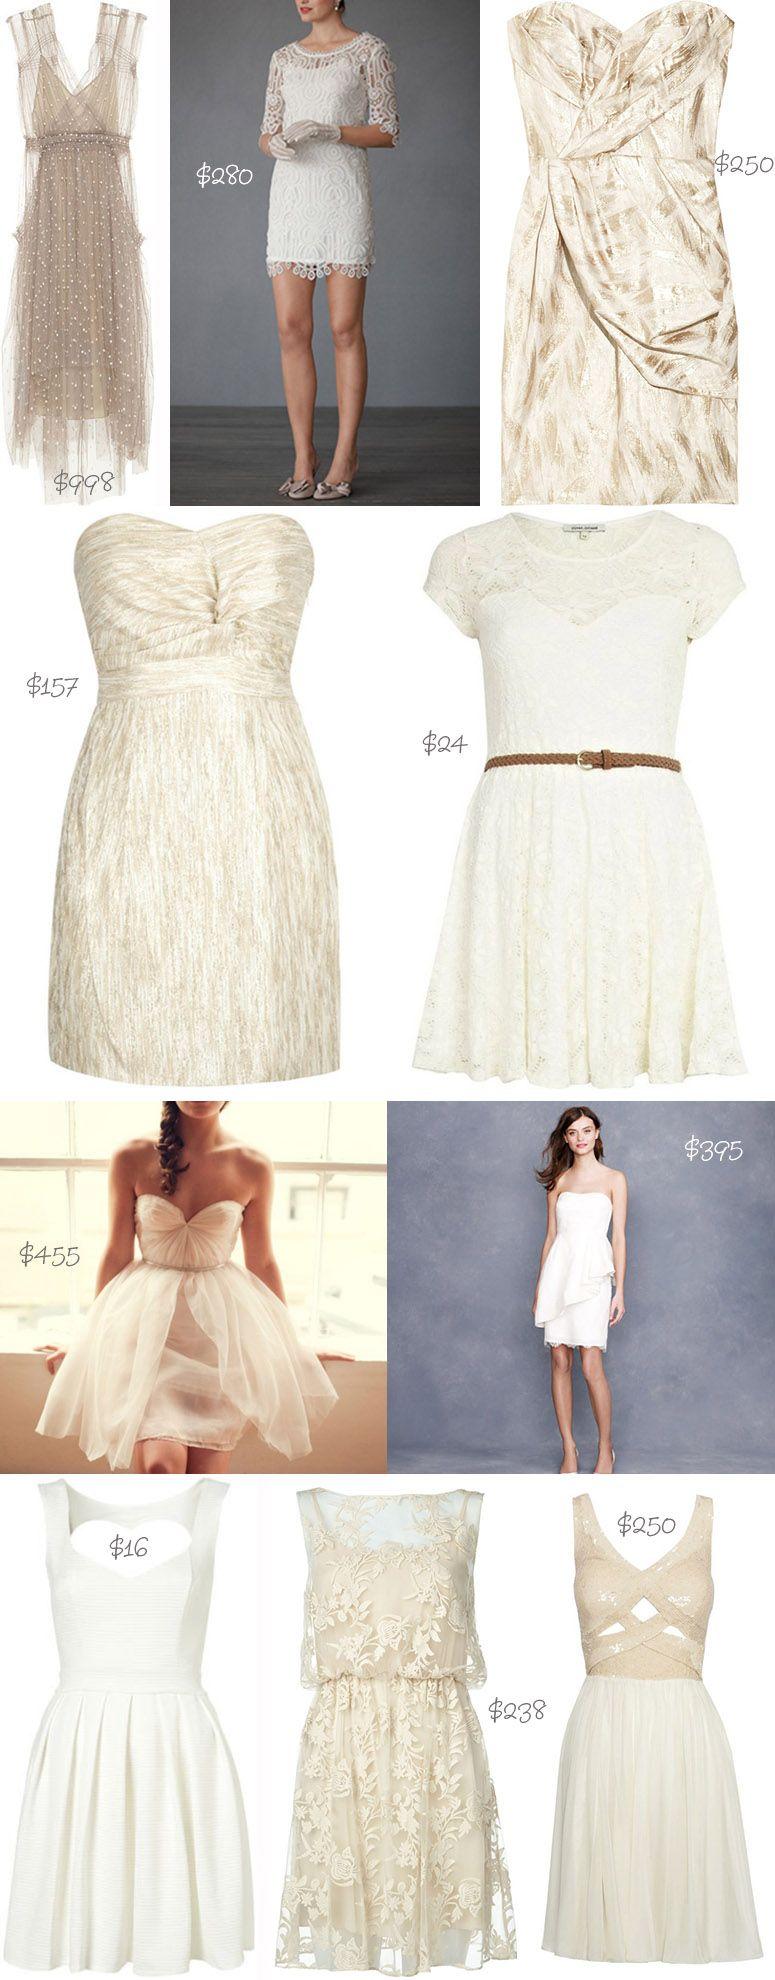 Mustsee pinspiration top wedding reception dress ideas from